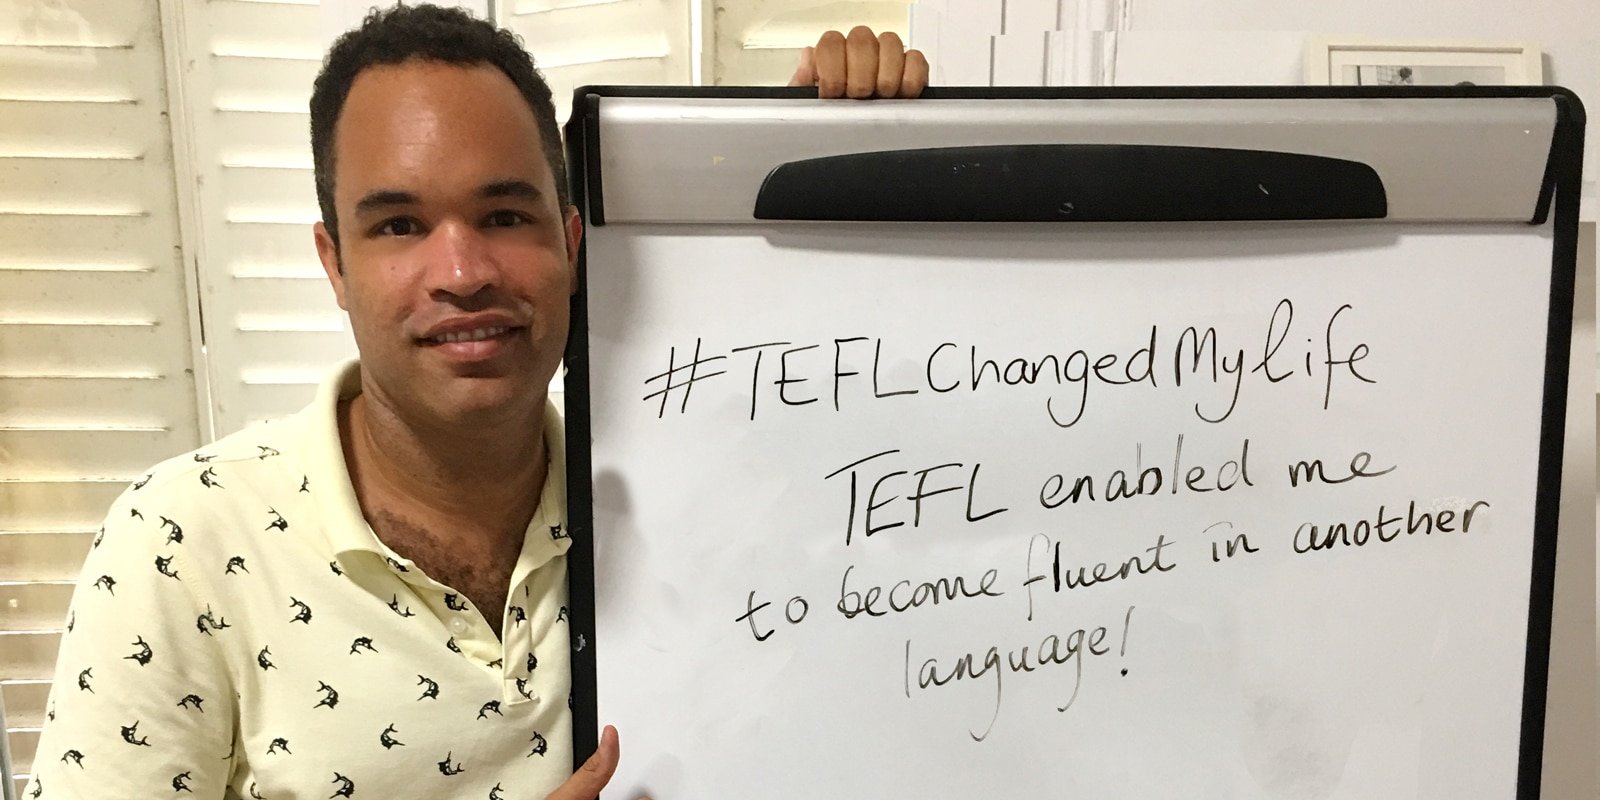 TEFL Changed my life- Rory